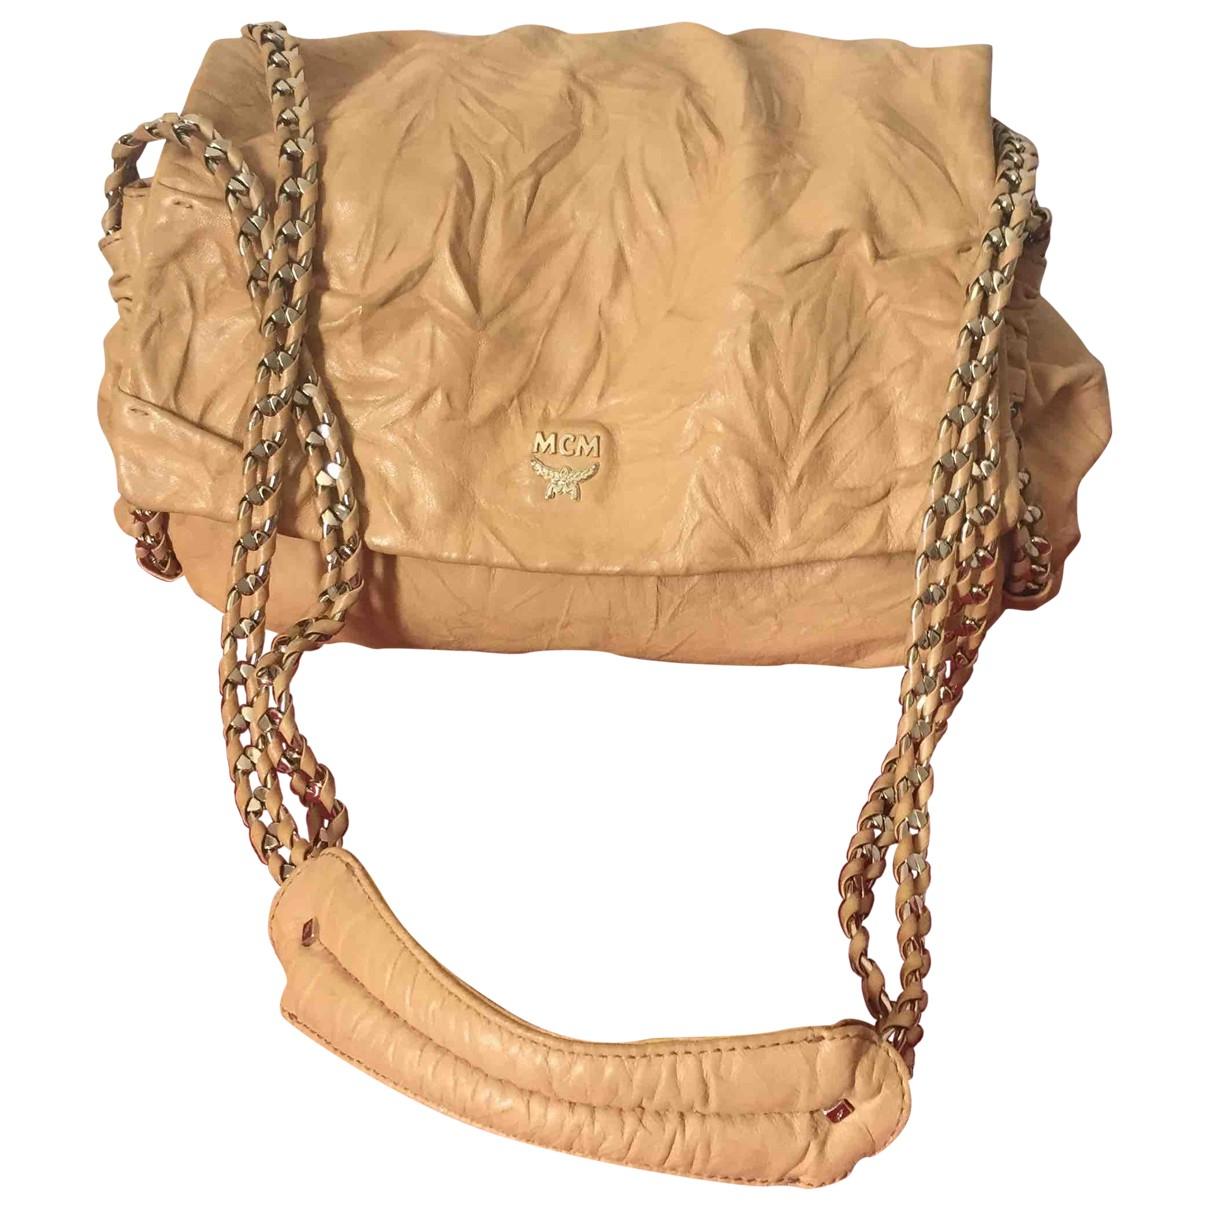 Mcm \N Gold Leather handbag for Women \N